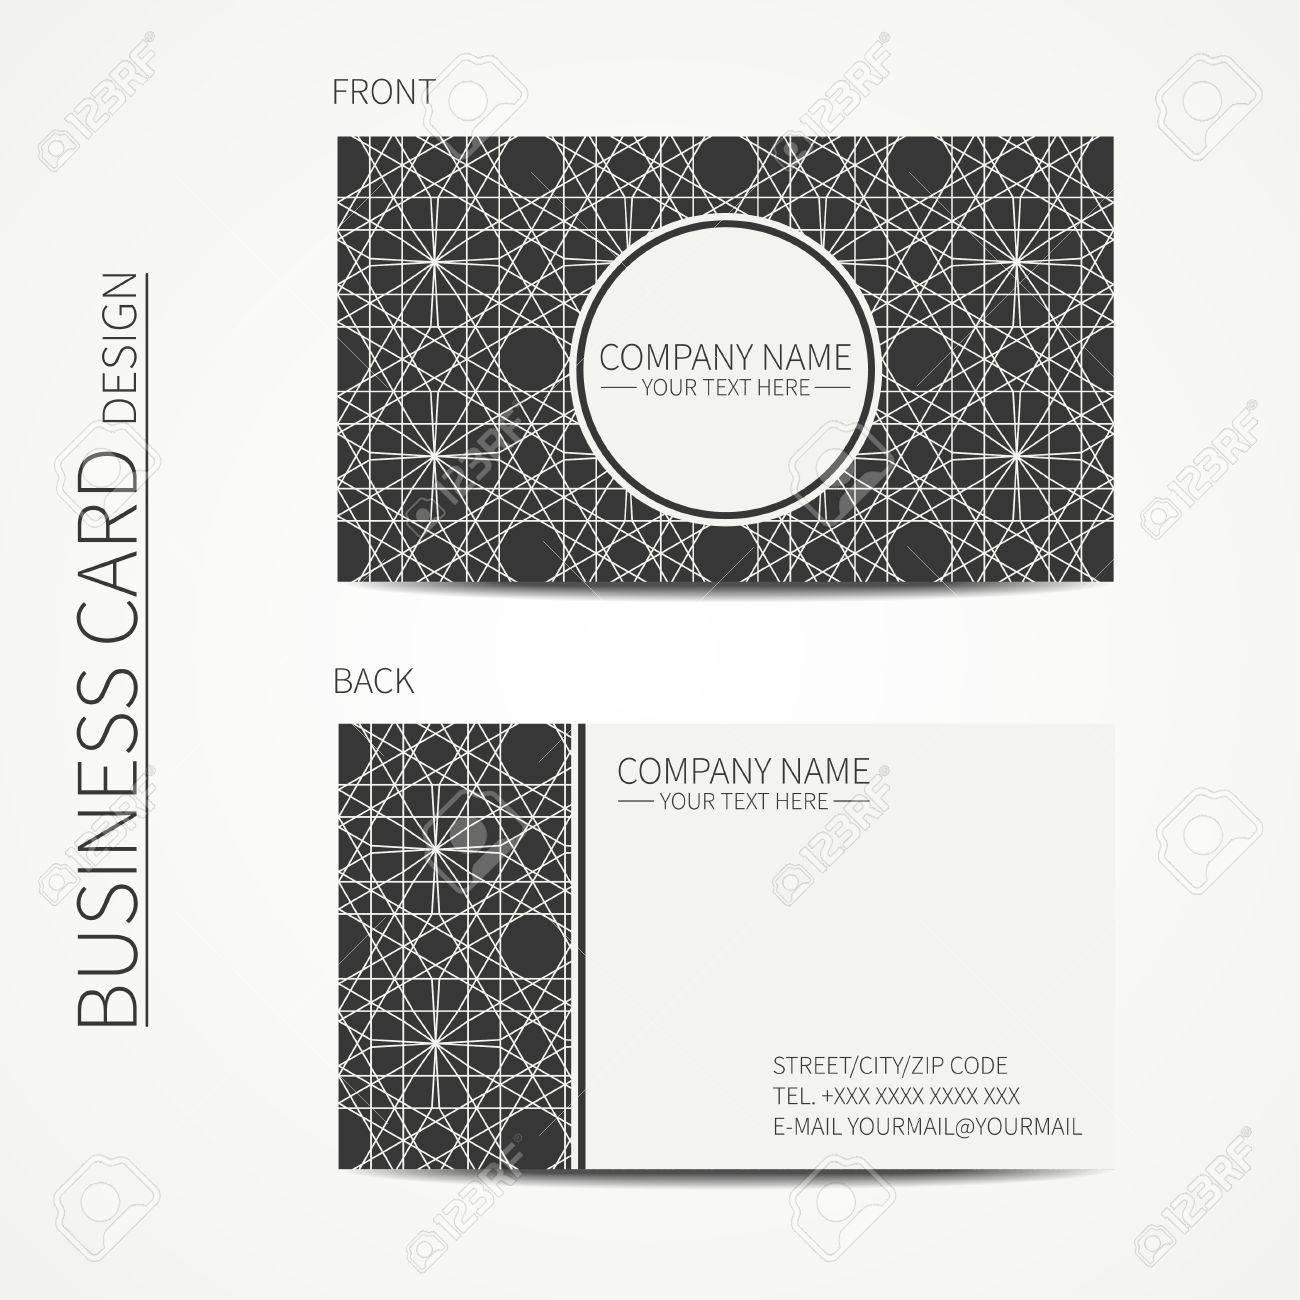 Geometric lattice monochrome business card template for design geometric lattice monochrome business card template for design arabic pattern islamic oriental style reheart Choice Image